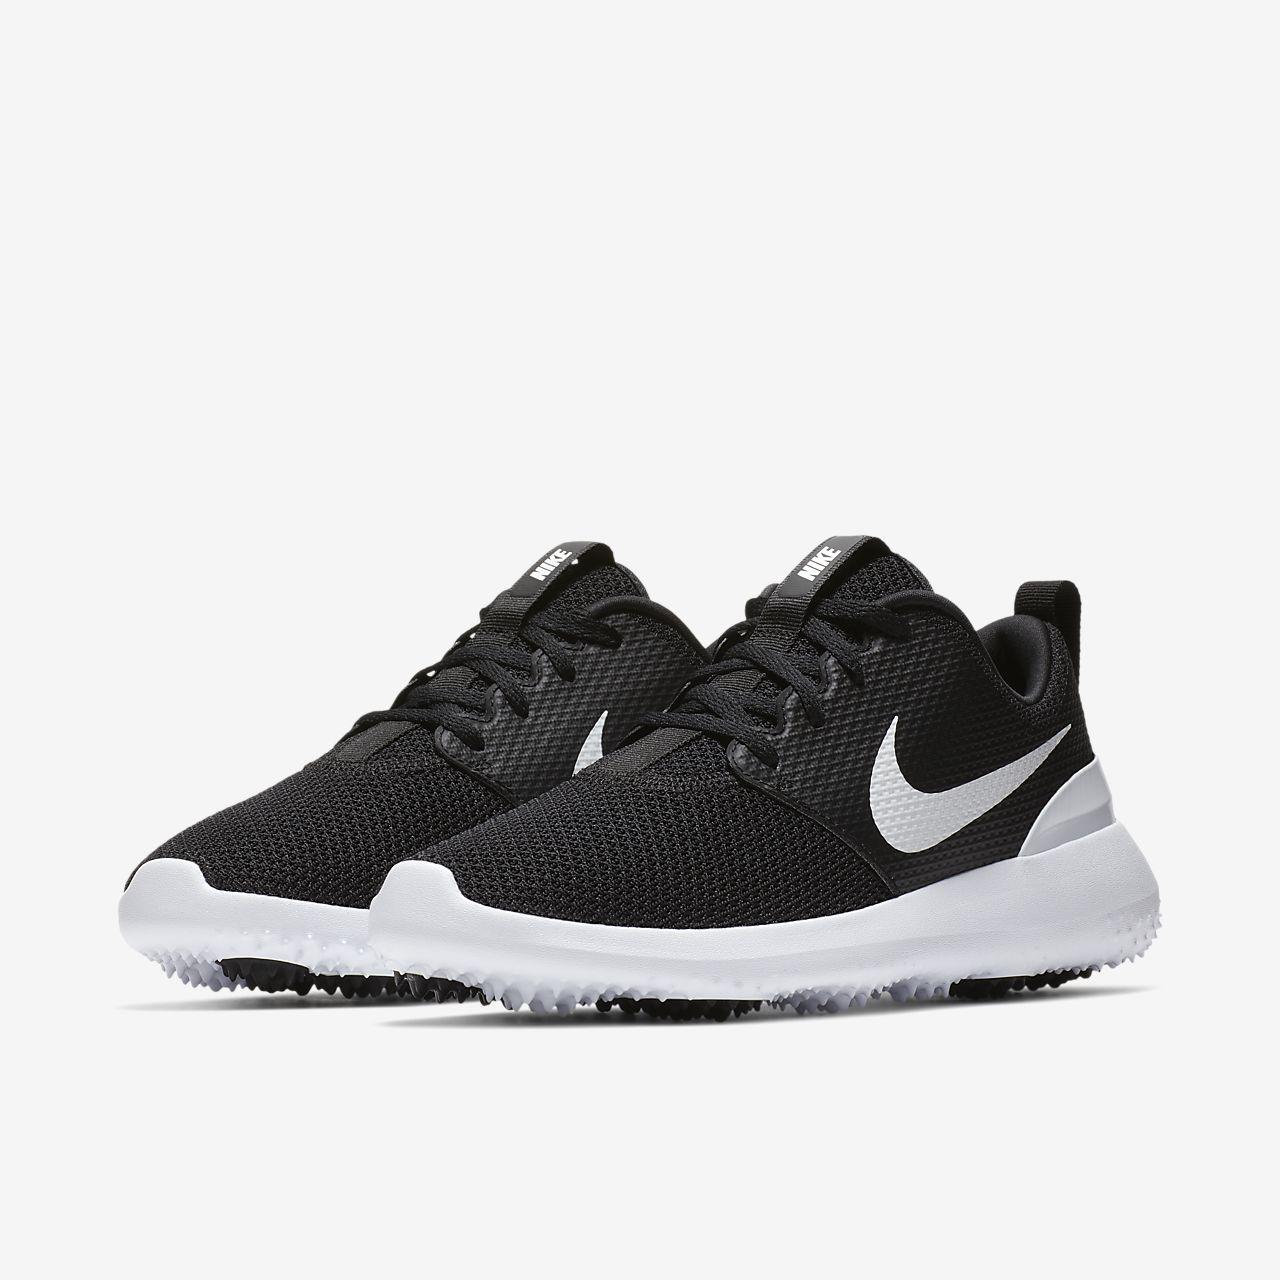 en soldes 19b22 11c64 Chaussure de golf Nike Roshe G pour Femme